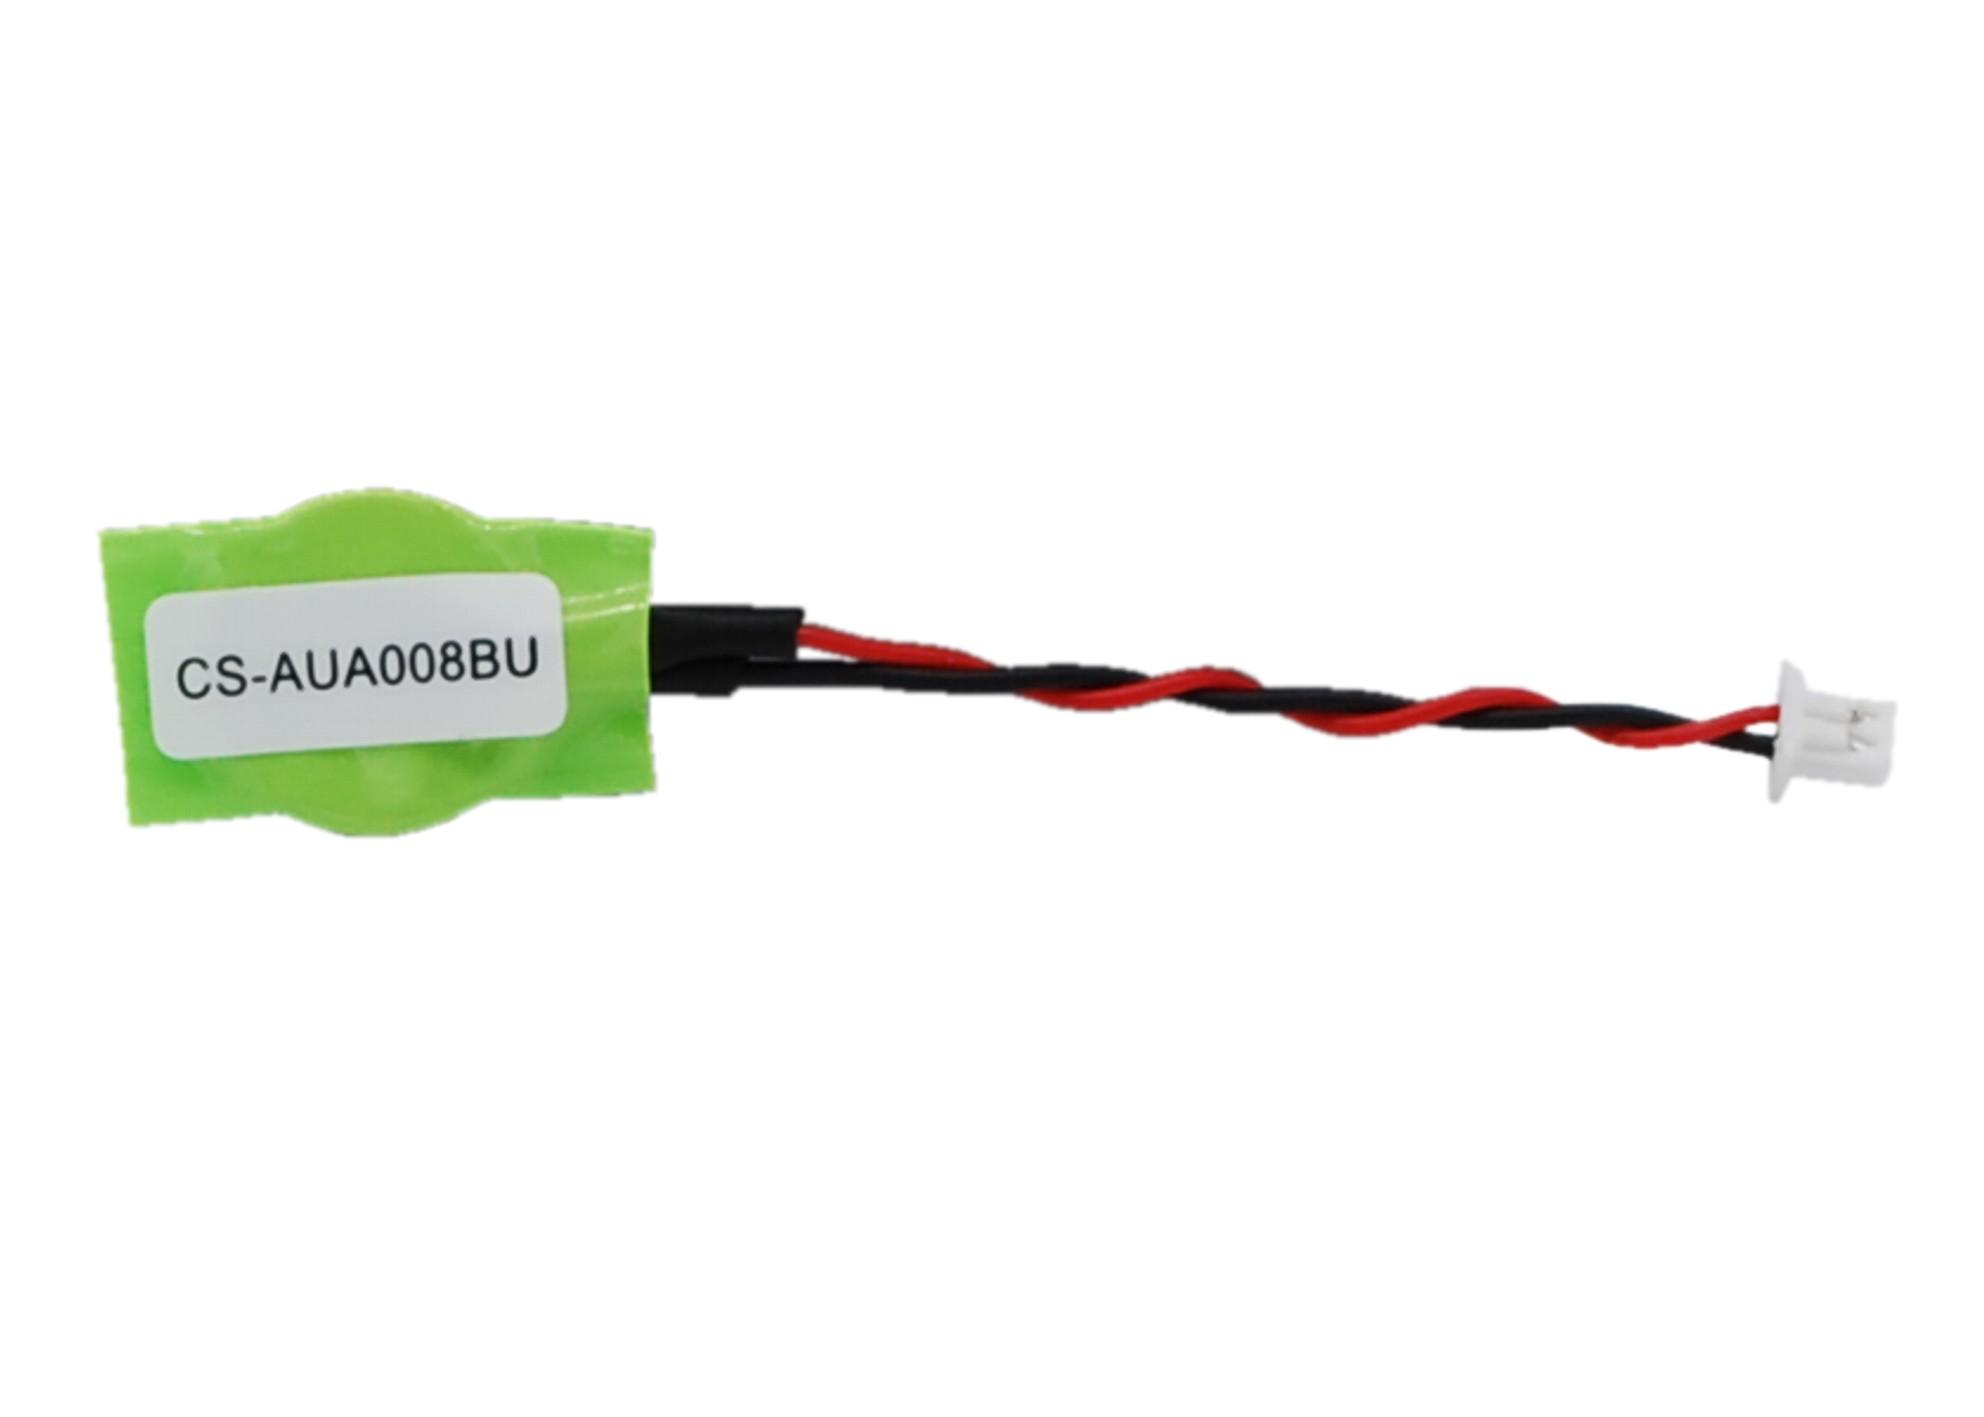 Cameron Sino baterie cmos pro ASUS Eee PC 1005HA-V 3V Li-ion 40mAh zelená - neoriginální